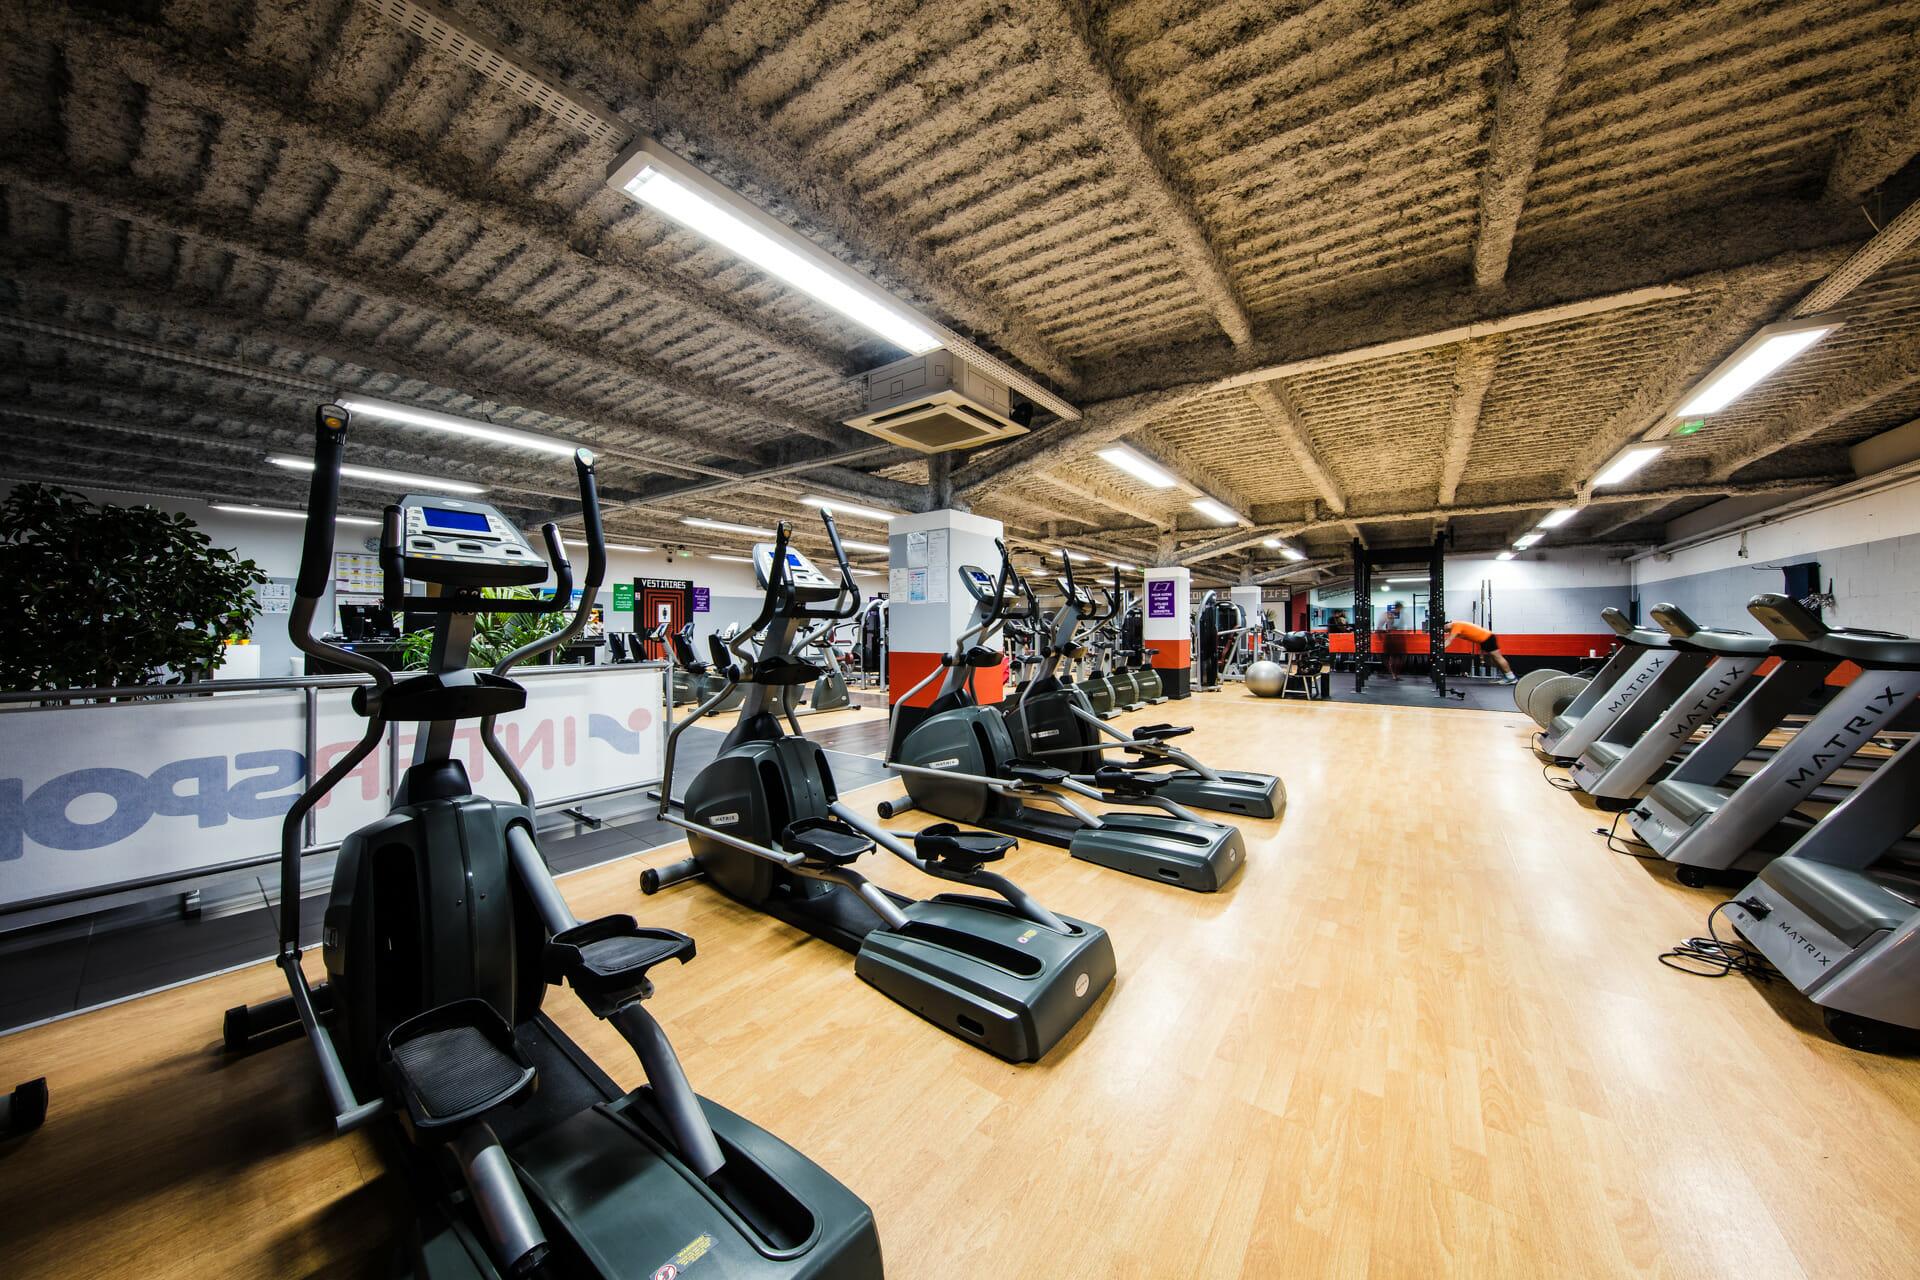 Cardio - Salle de sport - Avignon